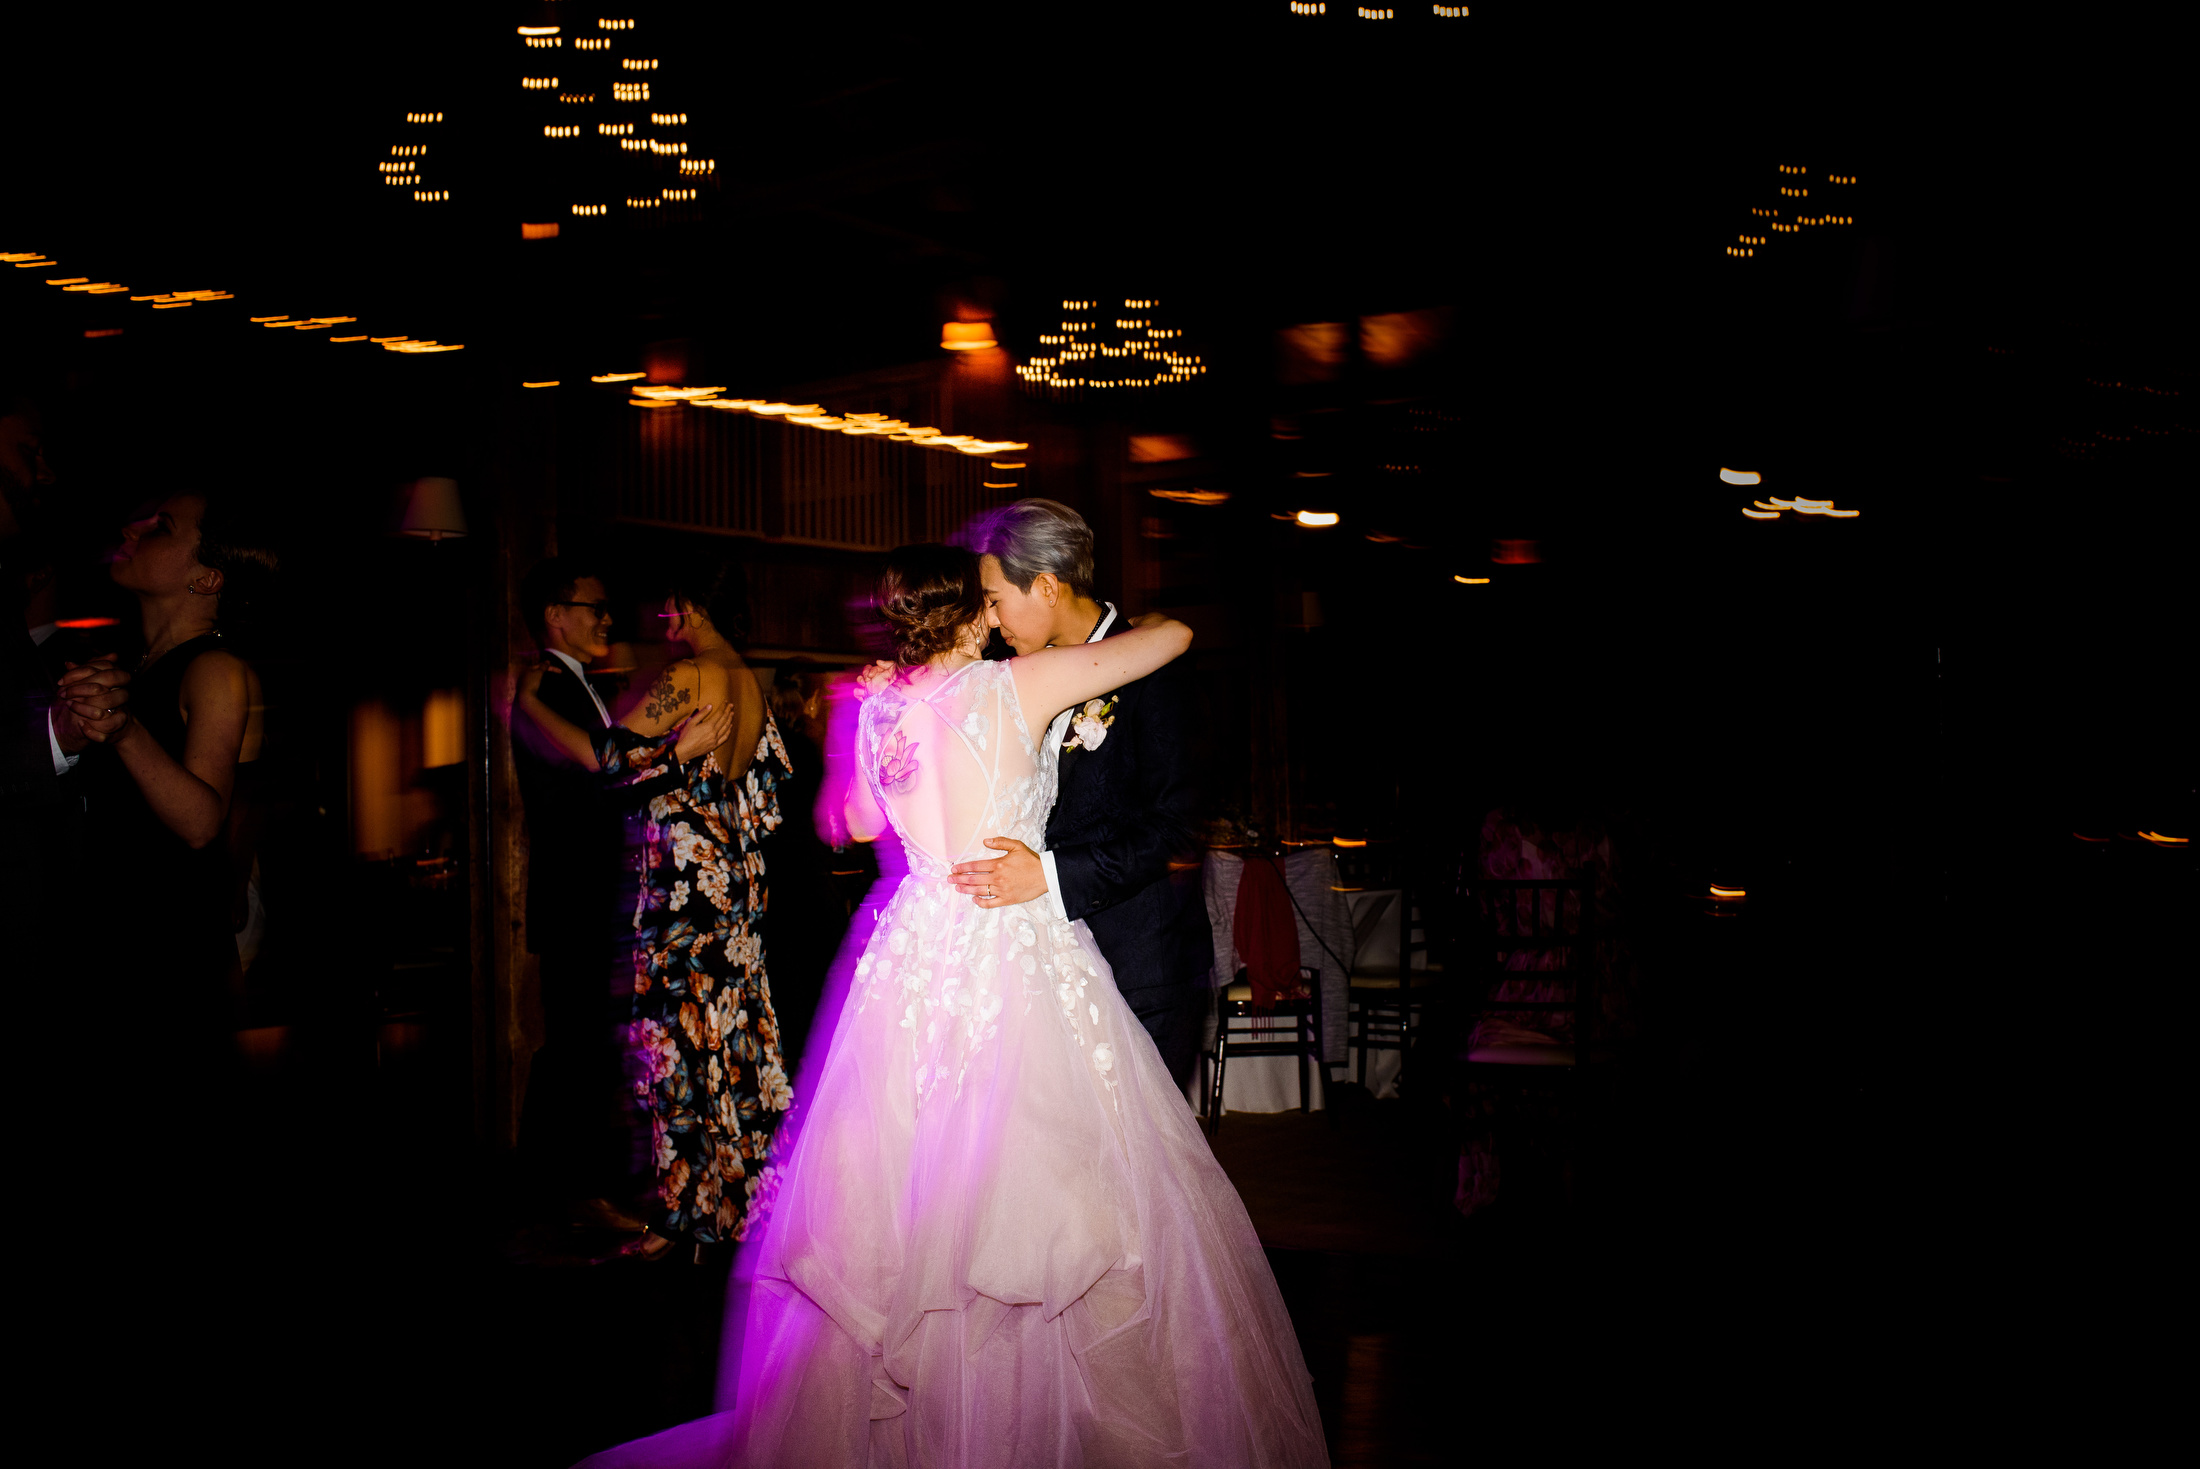 gibbet_hill_barn_same_sex_wedding_photos_65.JPG